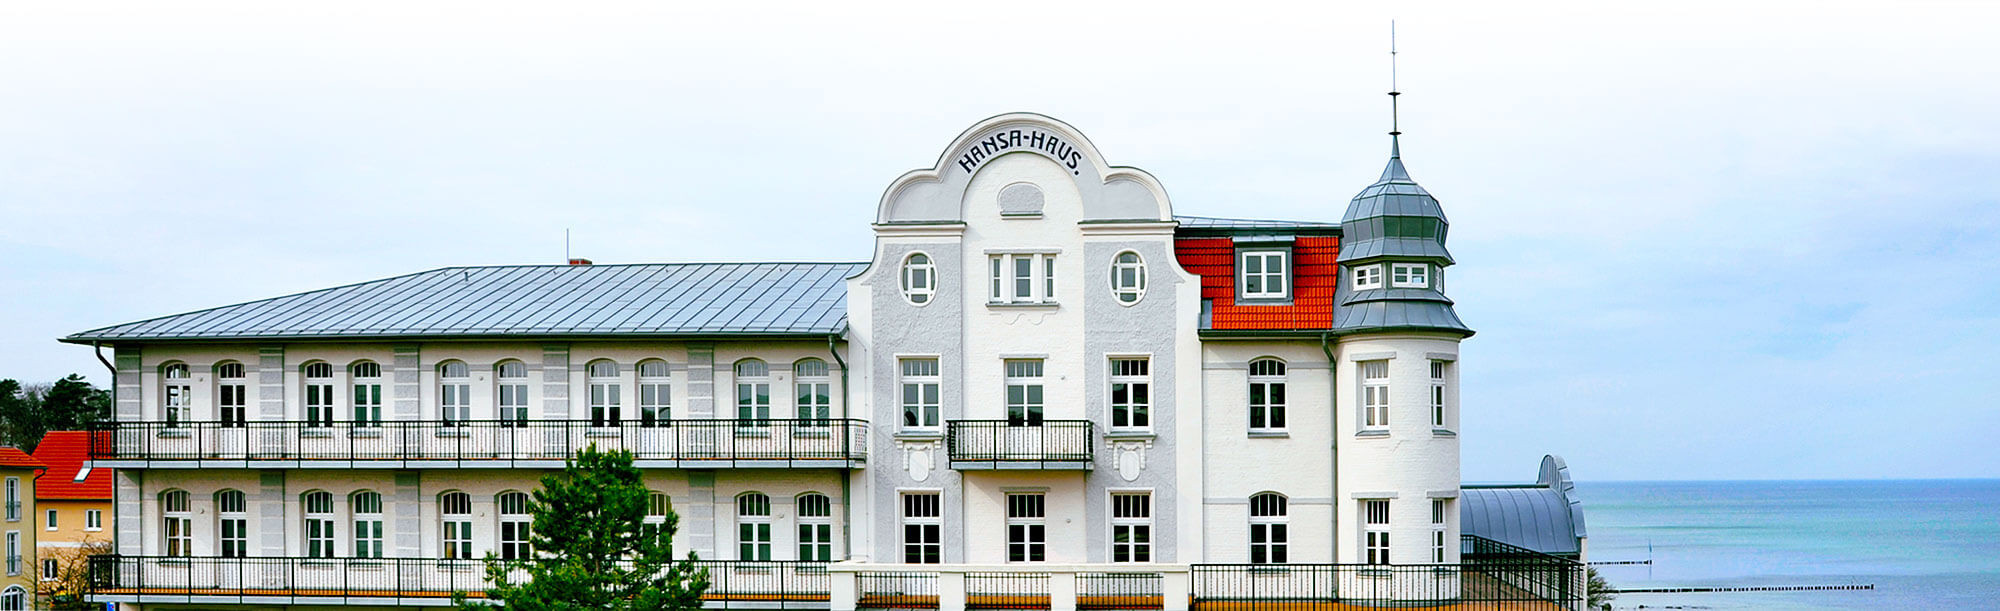 Hansa Haus  Häuser – Hotels in Kühlungsborn Hansa Haus & Schloss am Meer